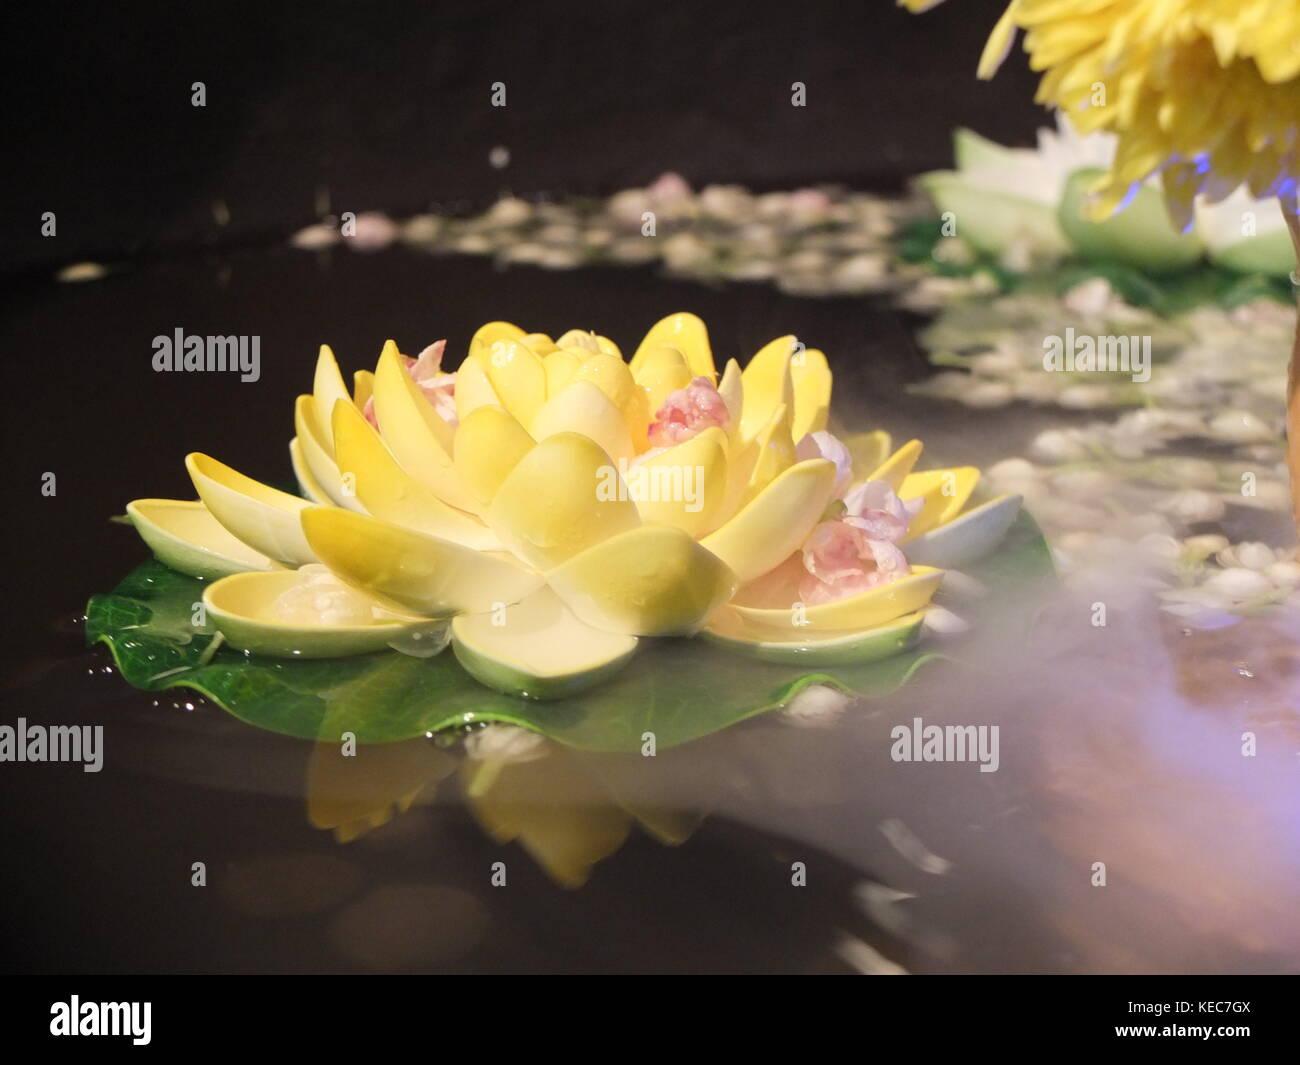 May 9 2017 Kuala Lumpur Selangor Malaysia The Lotus Flower